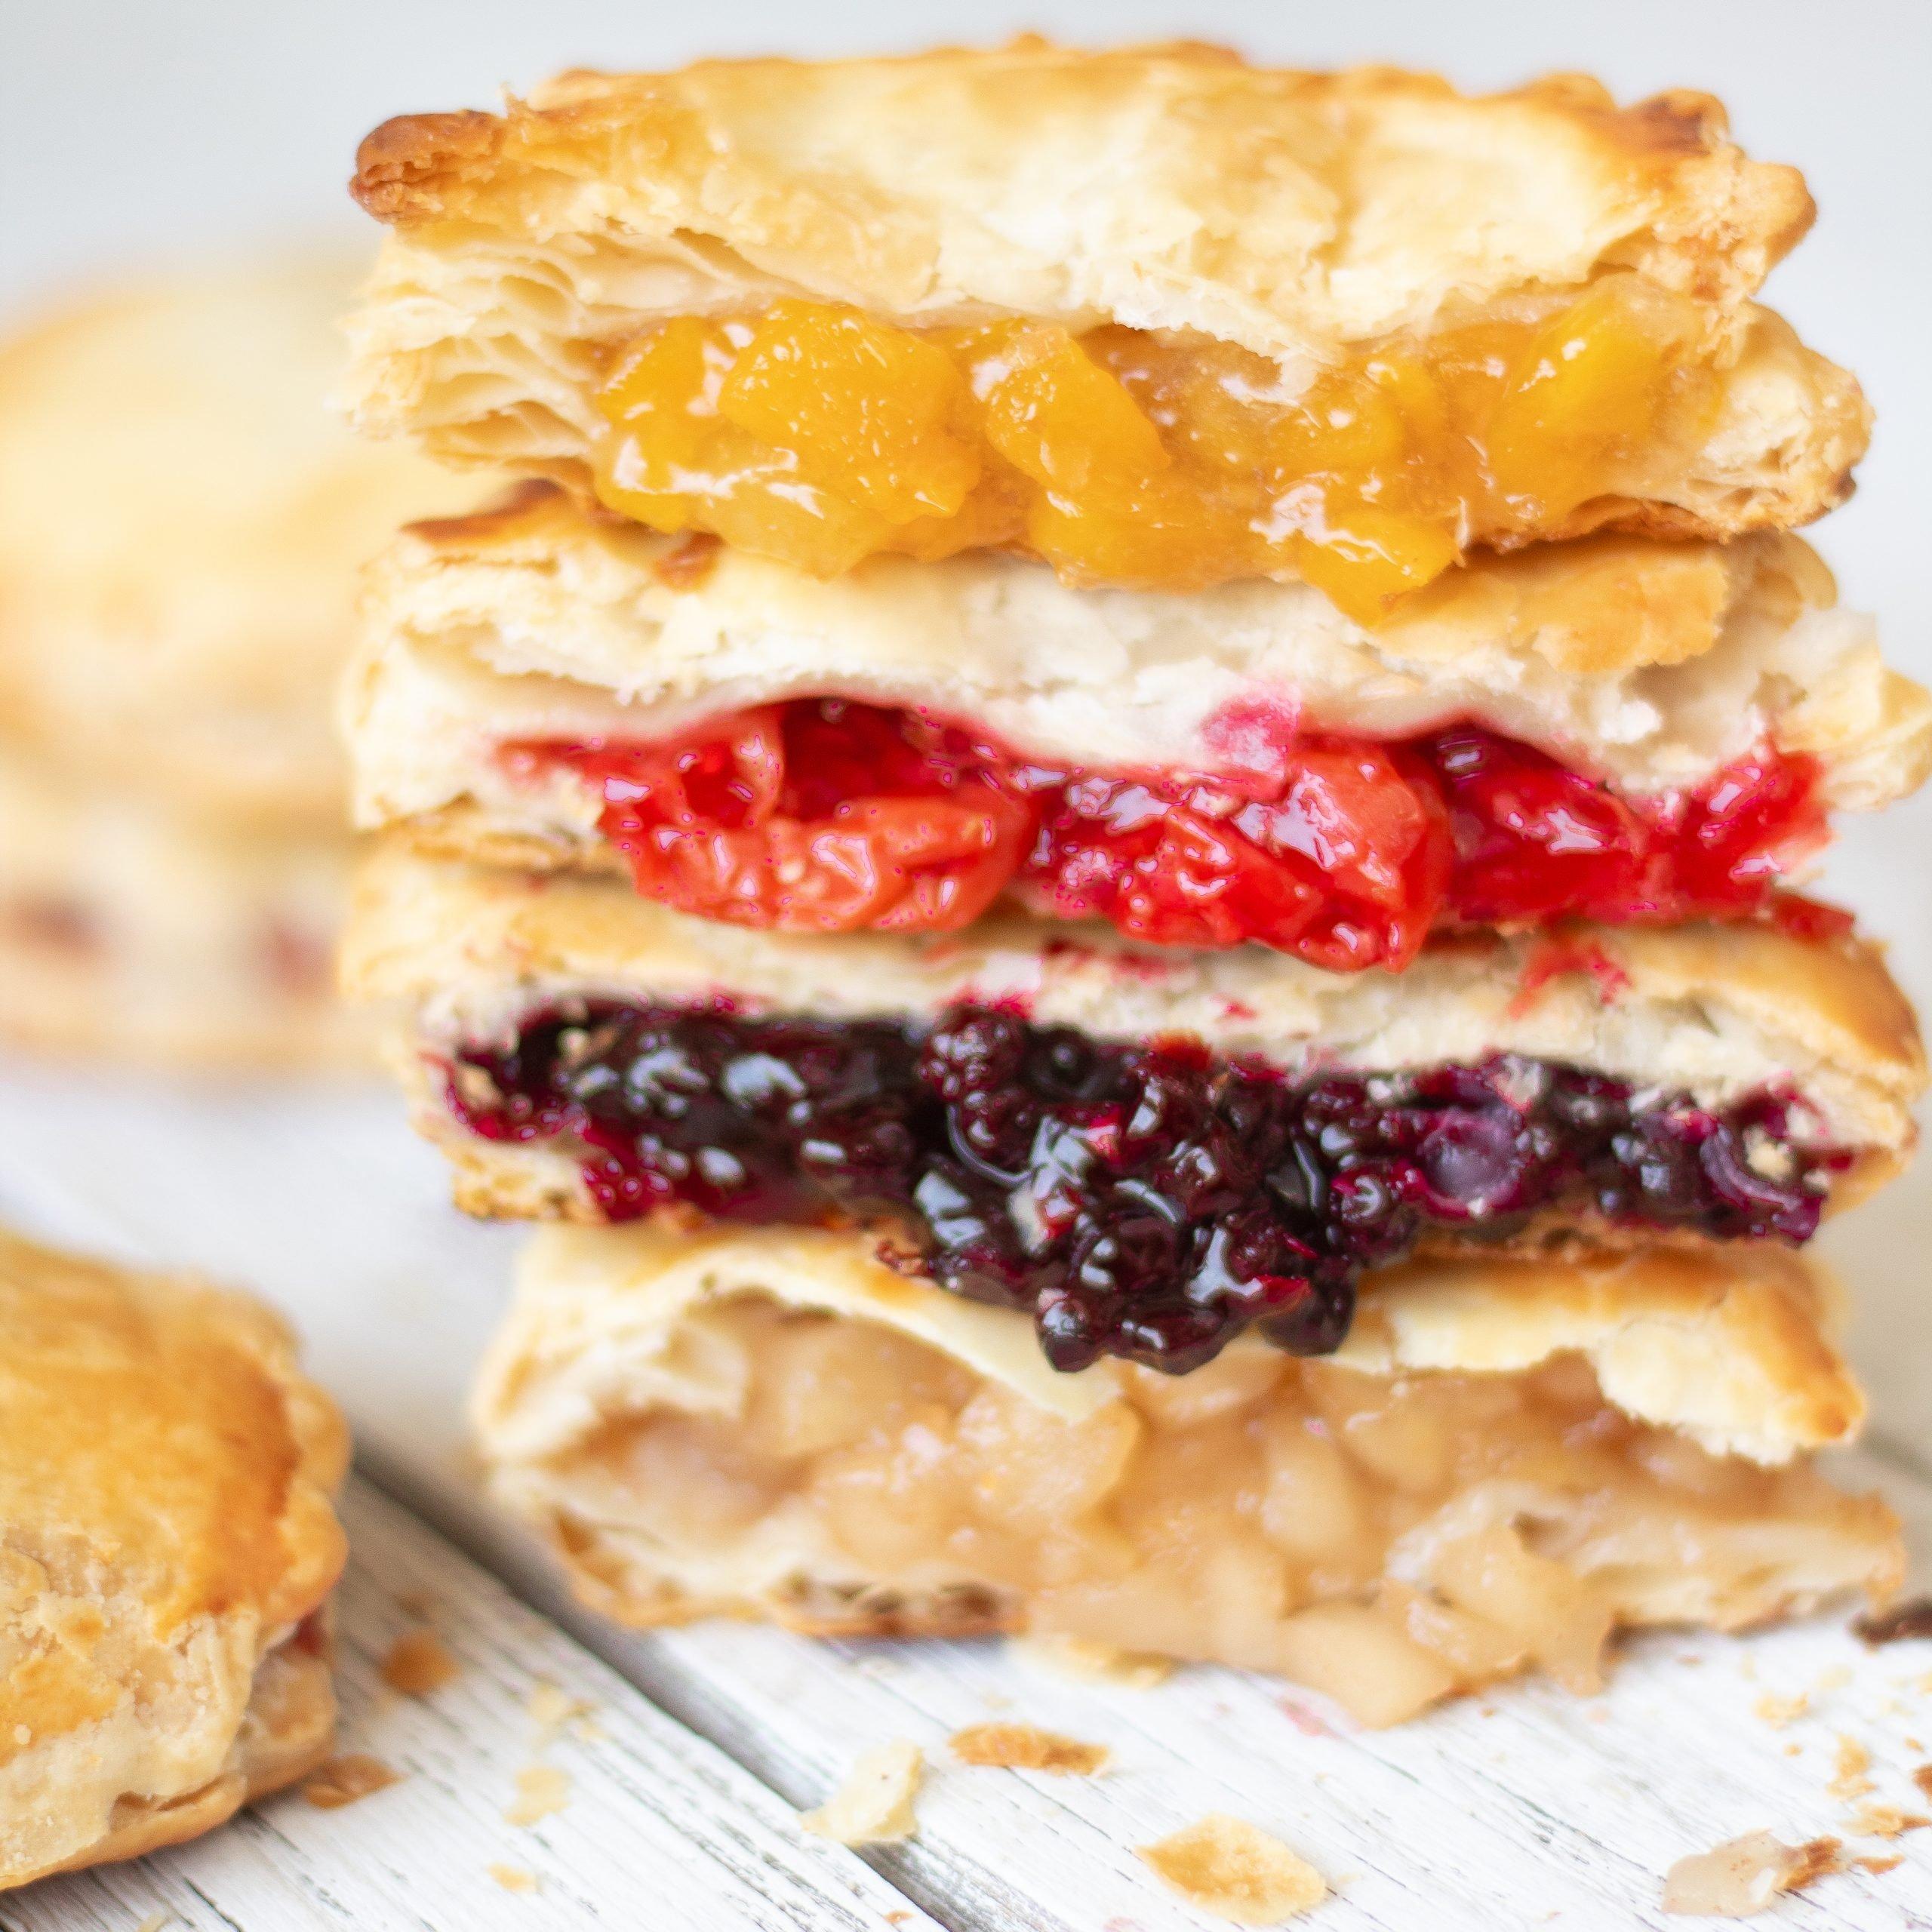 Mamie's Pies Wicked Good | Variety 12 Pack